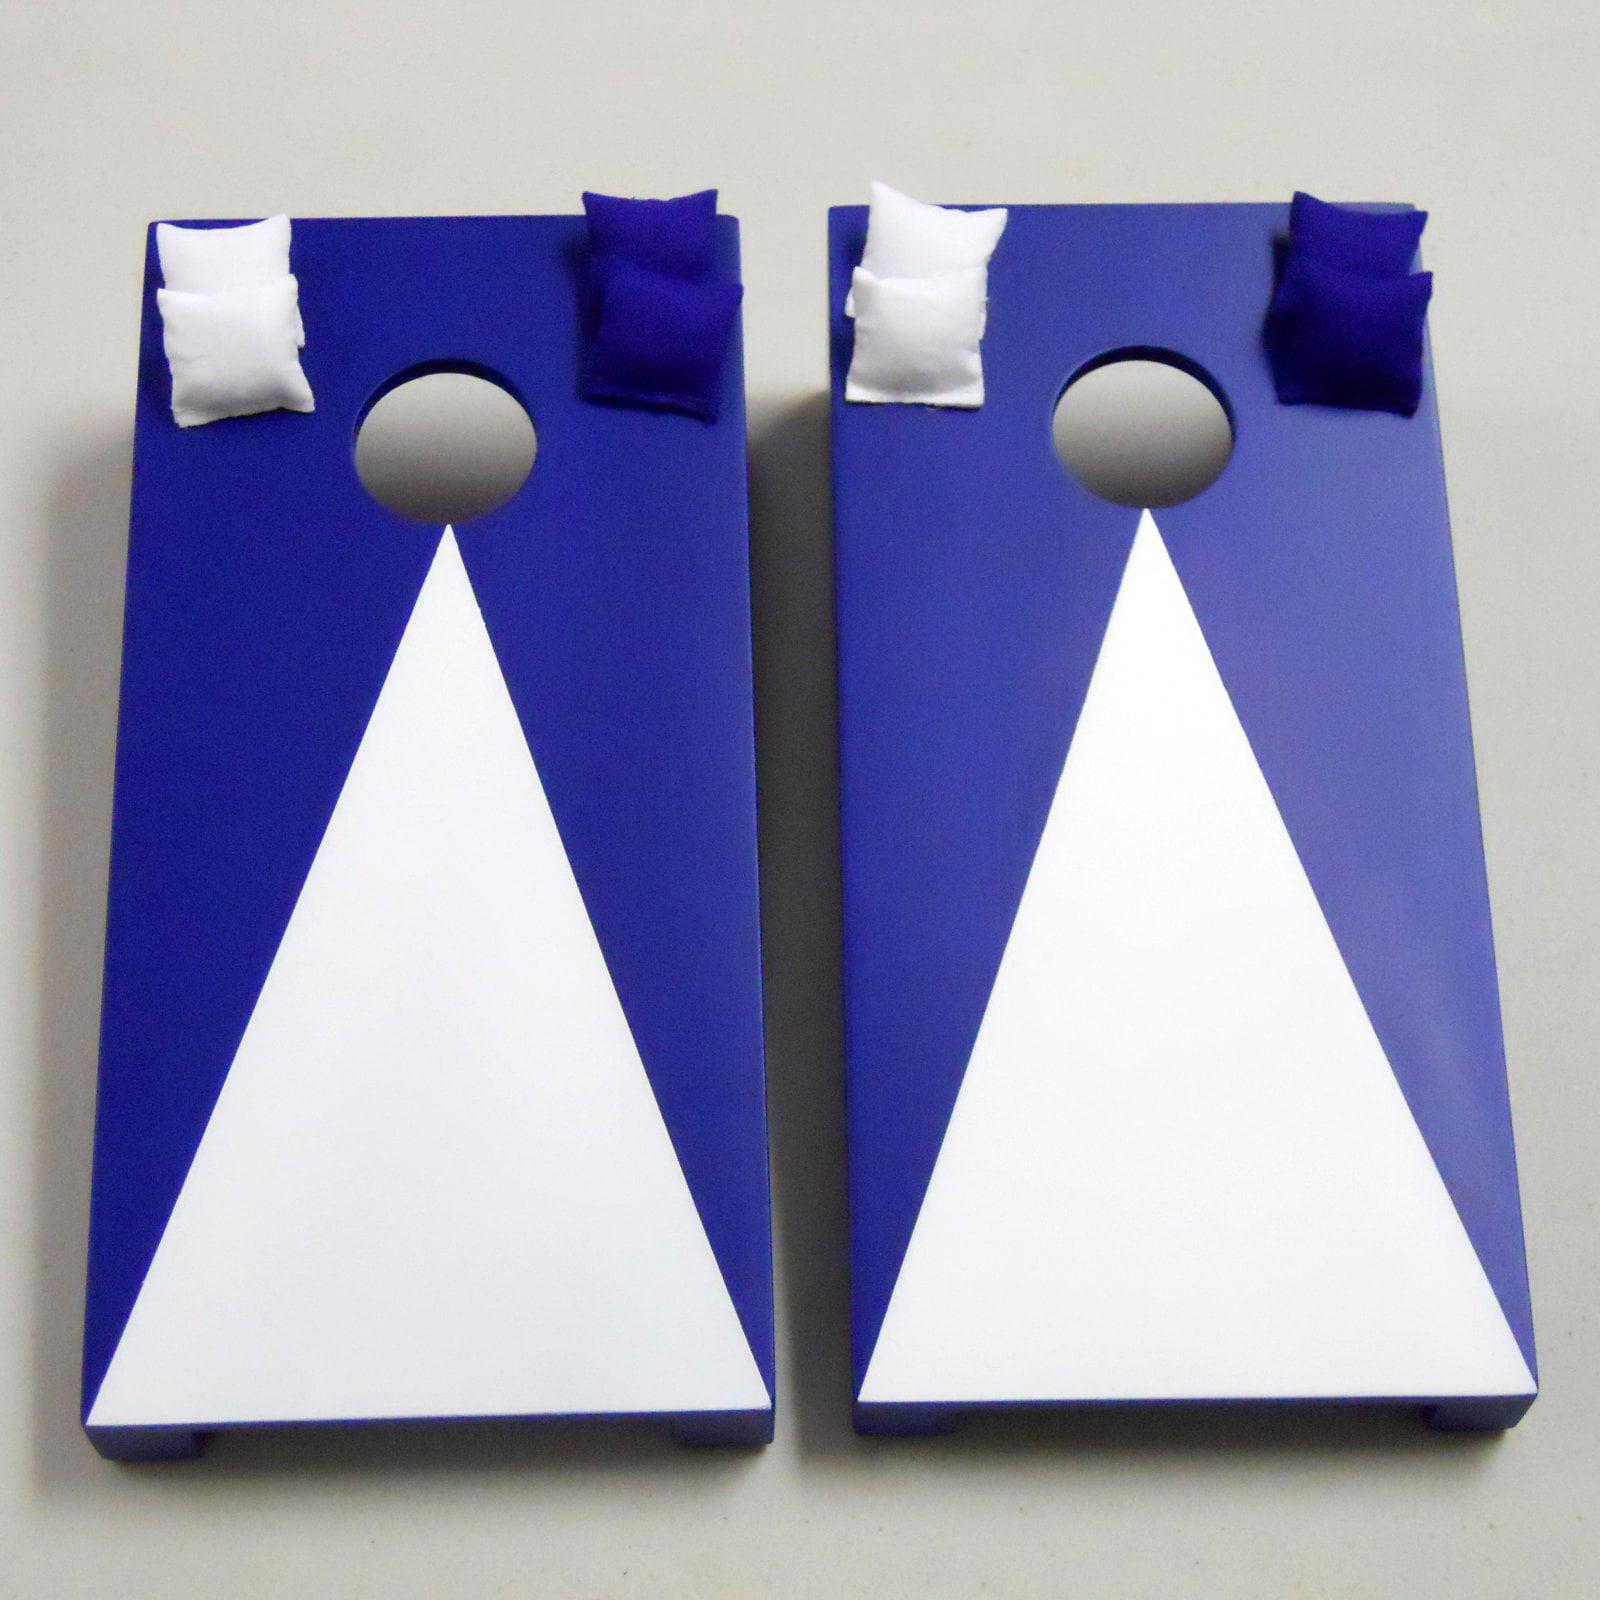 Navy Blue Pyramid Tabletop Cornhole Set by AJJ Cornhole